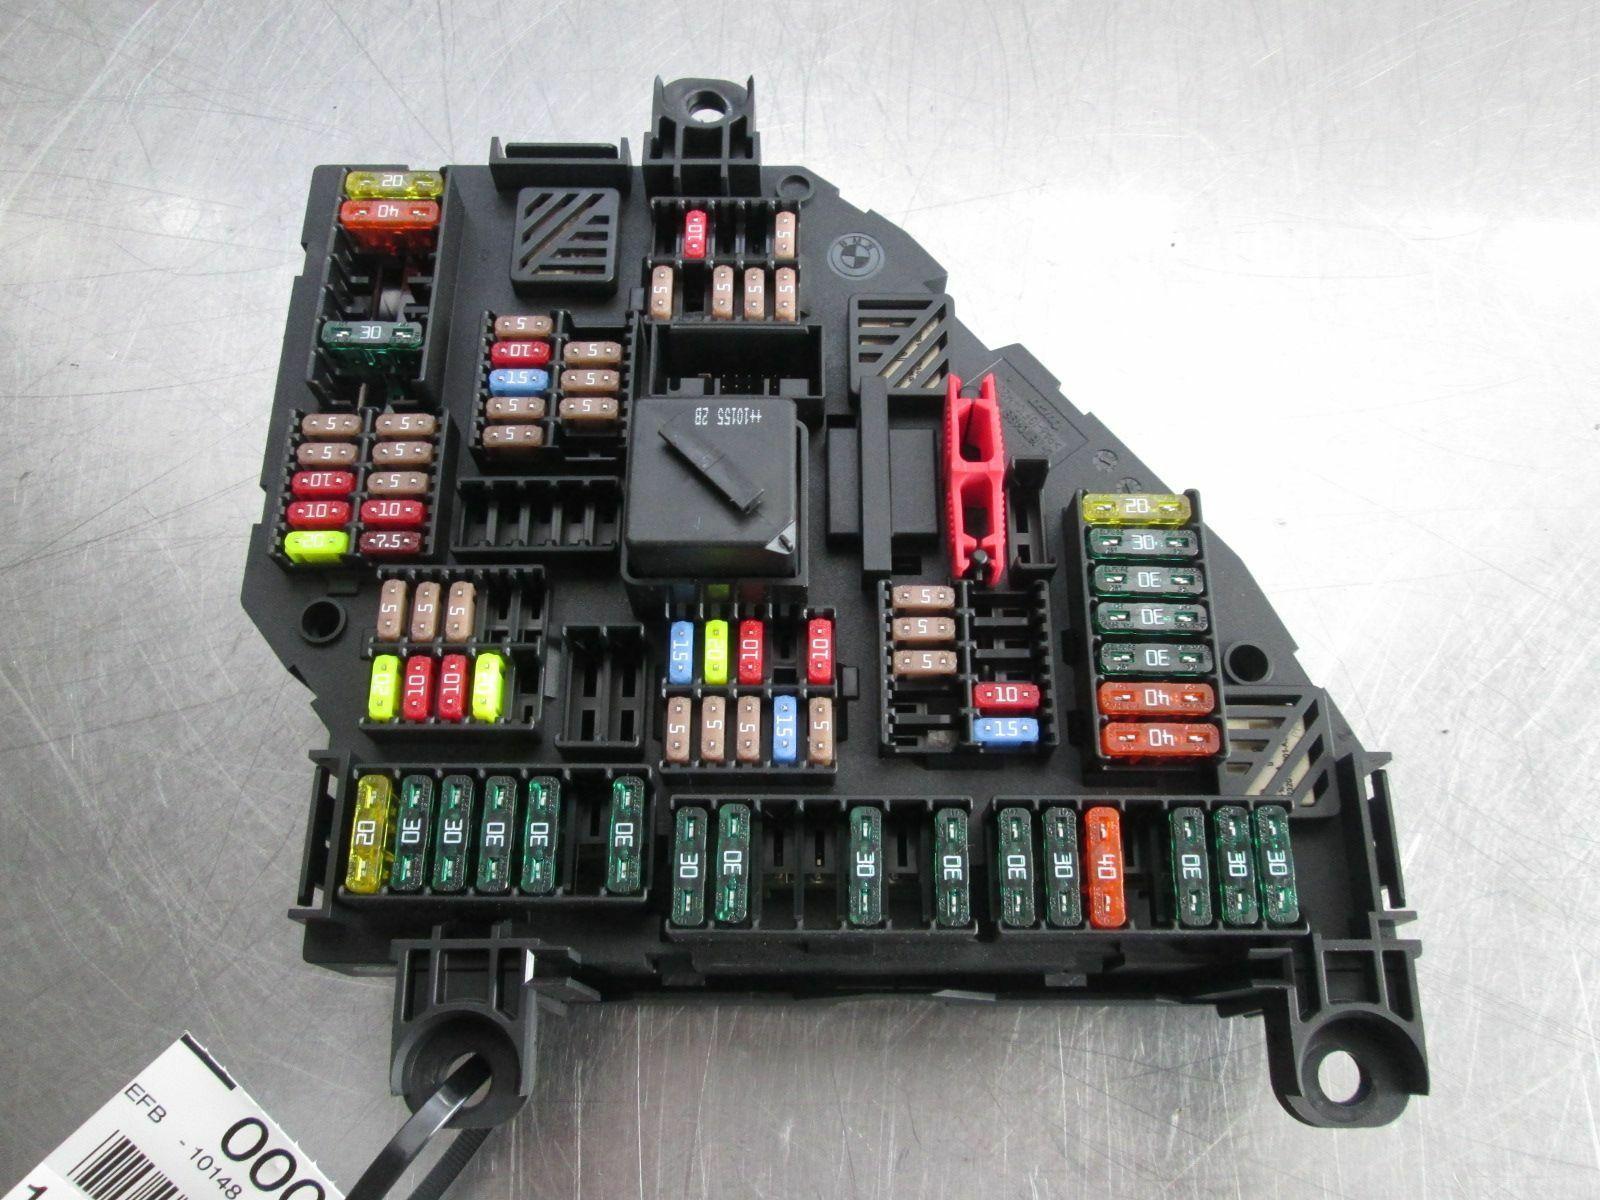 750 Bmw Fuse Box Schematic Diagram Electronic 2007 F